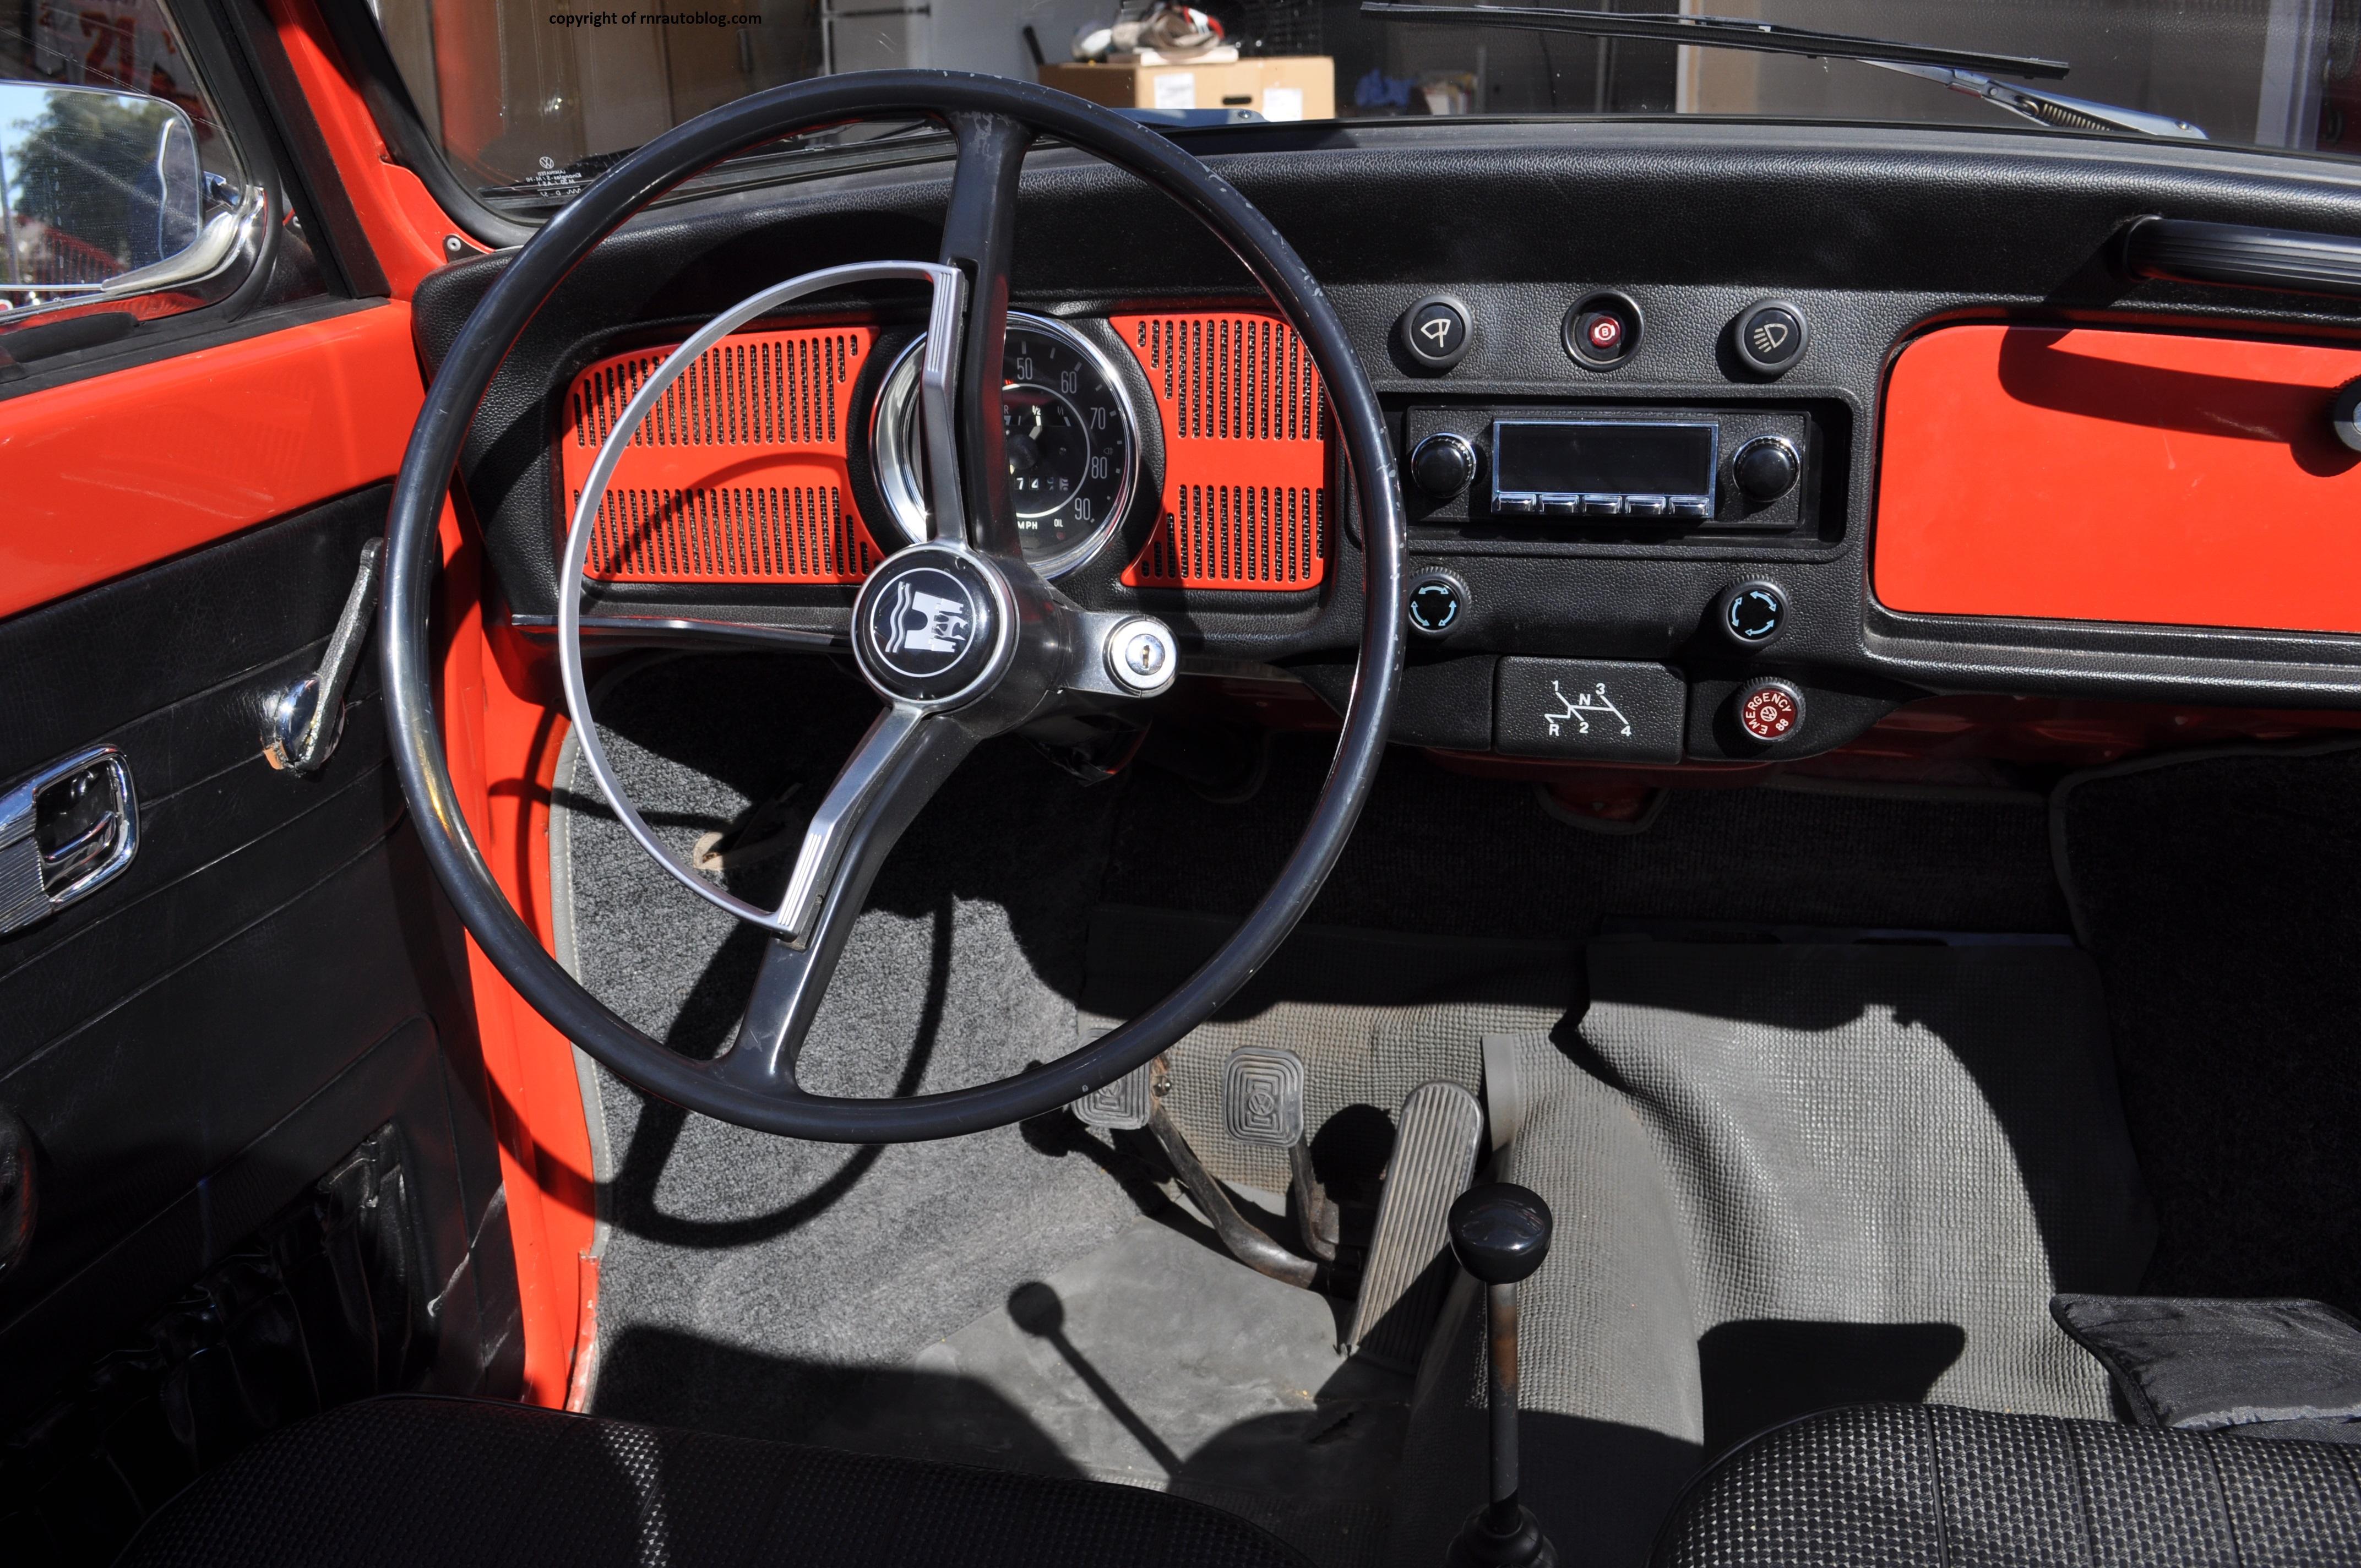 1969 Volkswagen Beetle Convertible Review Rnr Automotive